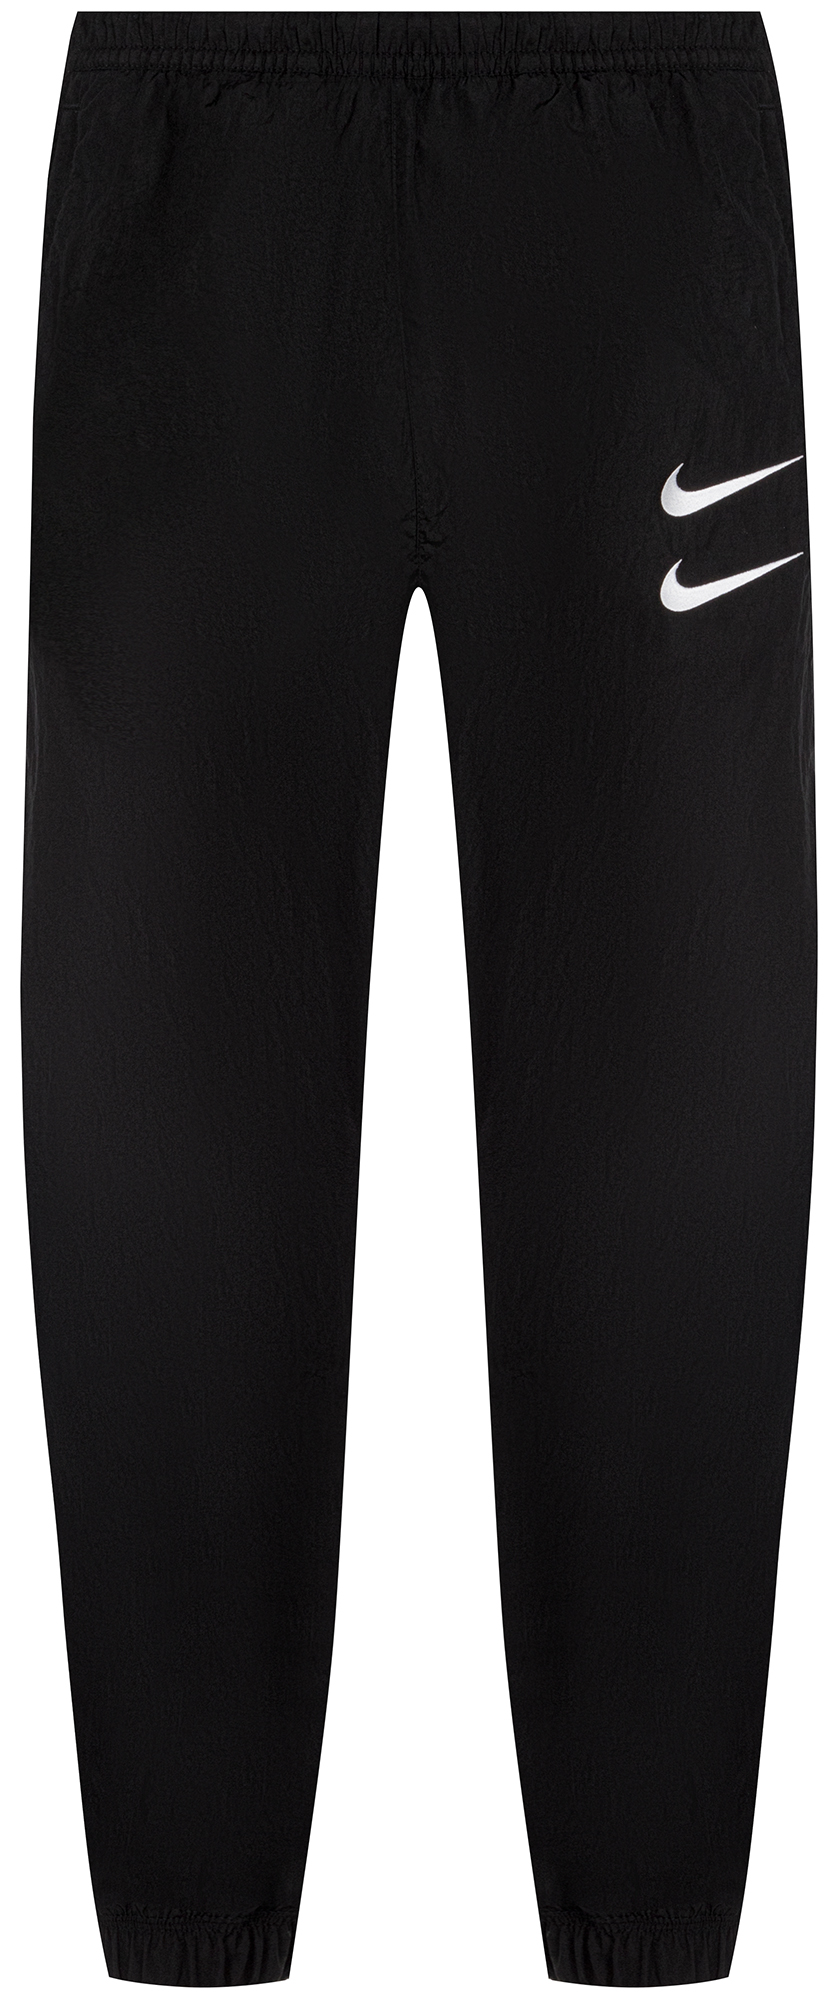 цена Nike Брюки мужские Nike Sportswear Swoosh, размер 46-48 онлайн в 2017 году